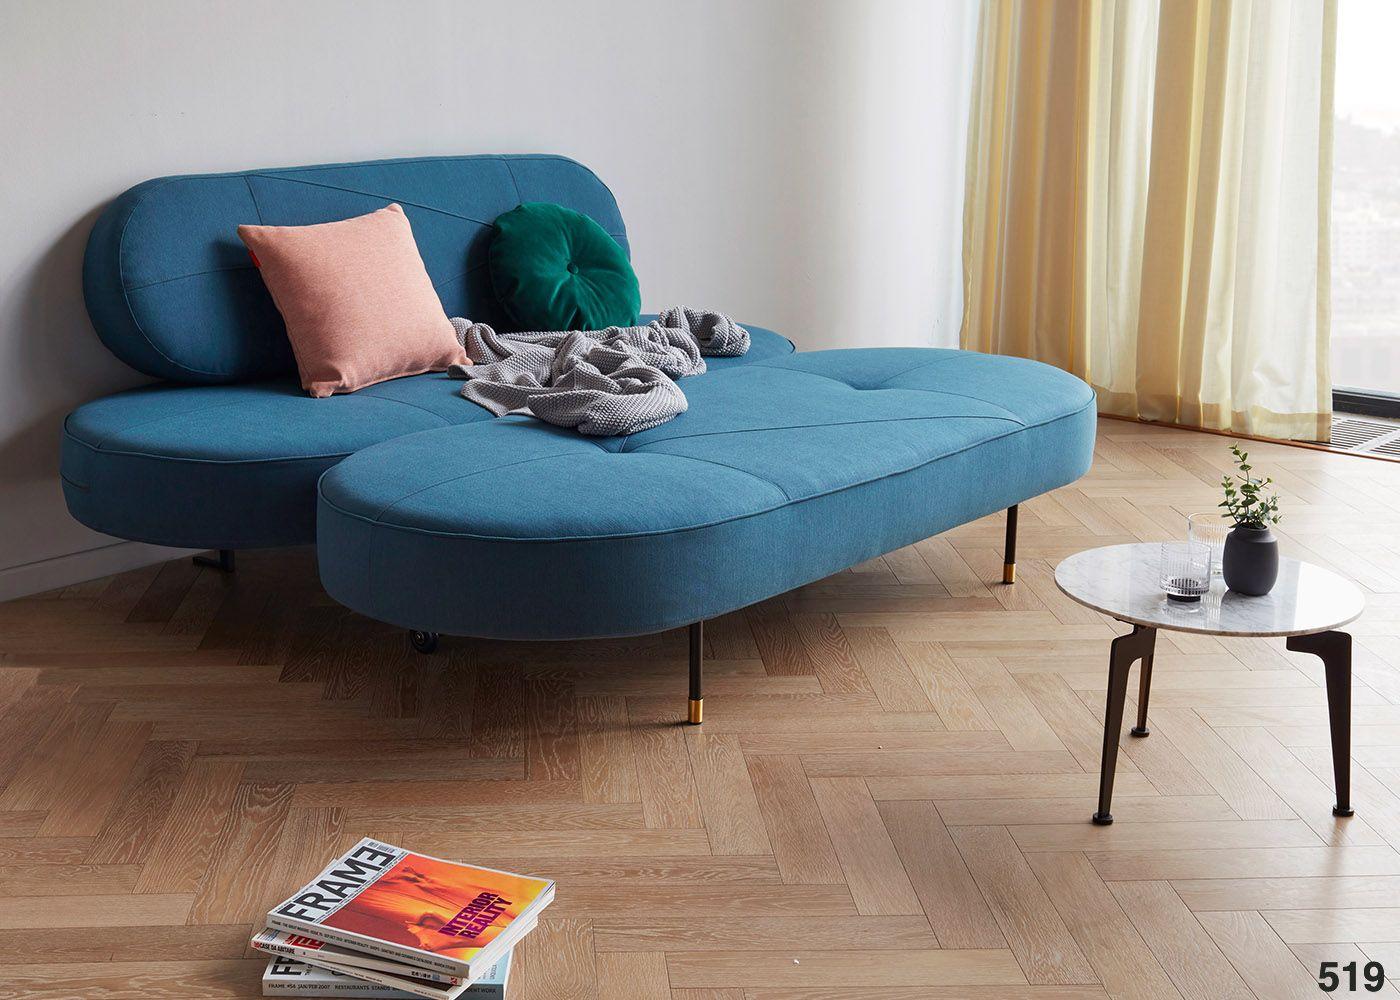 Canape Bleu Petrole Design Et Tendance Du Designer Per Weiss ... dedans Canape Convertible Original